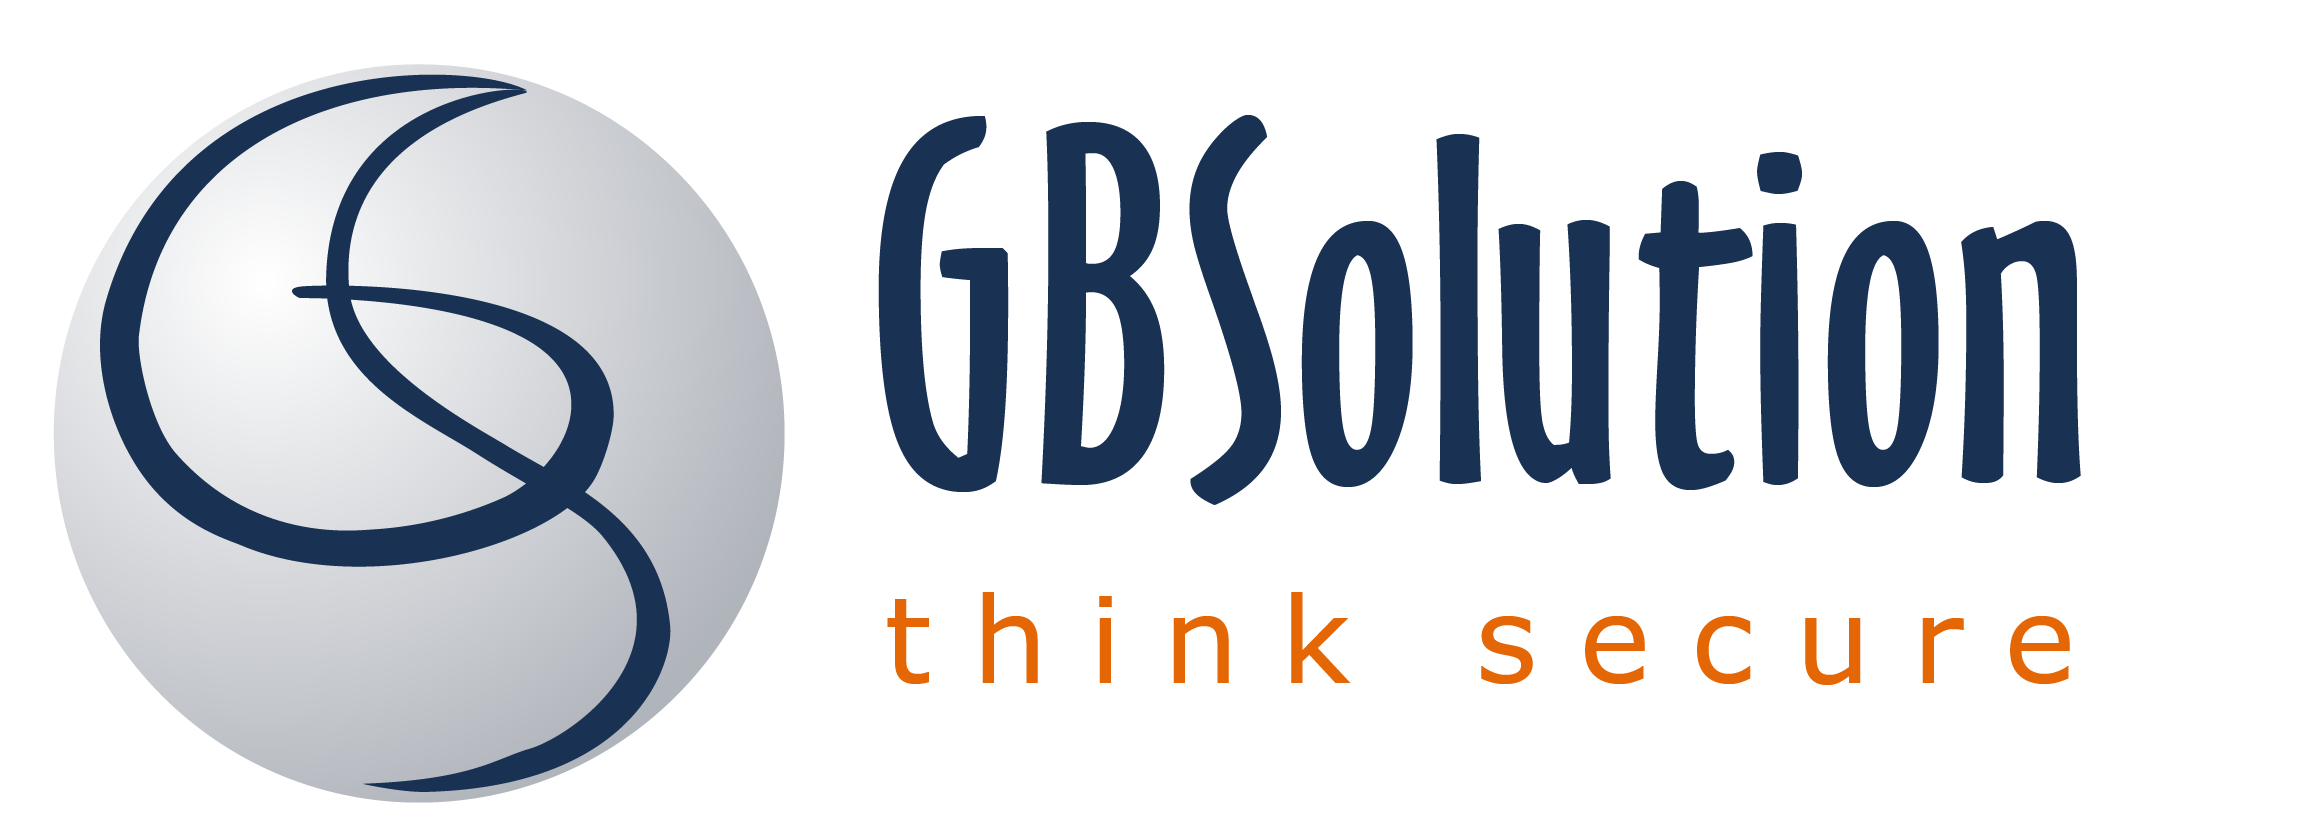 GBSolution